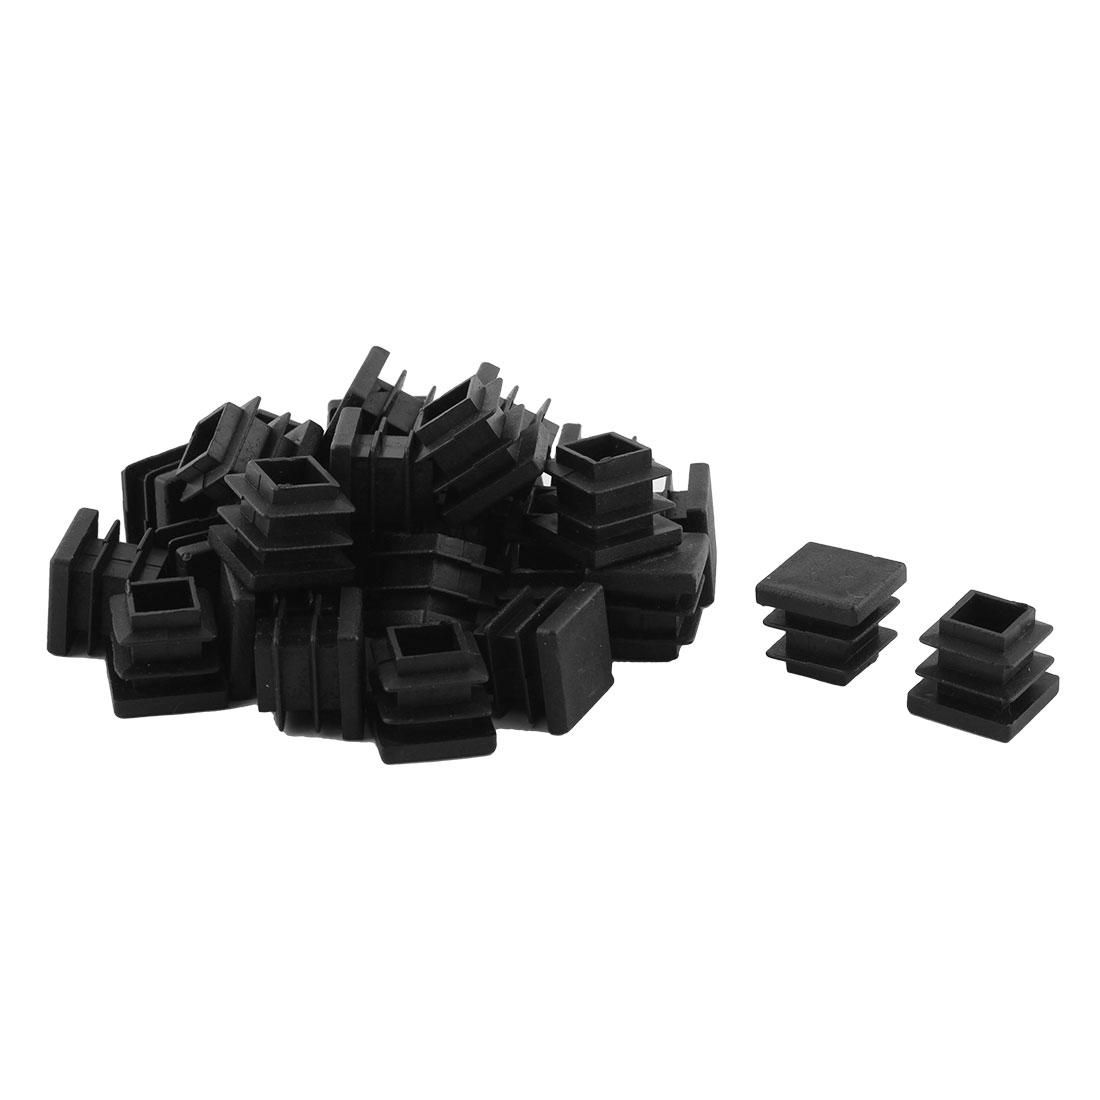 Home Office Plastic Square Table Chair Leg Tube Insert Black 16 x 16mm 30pcs